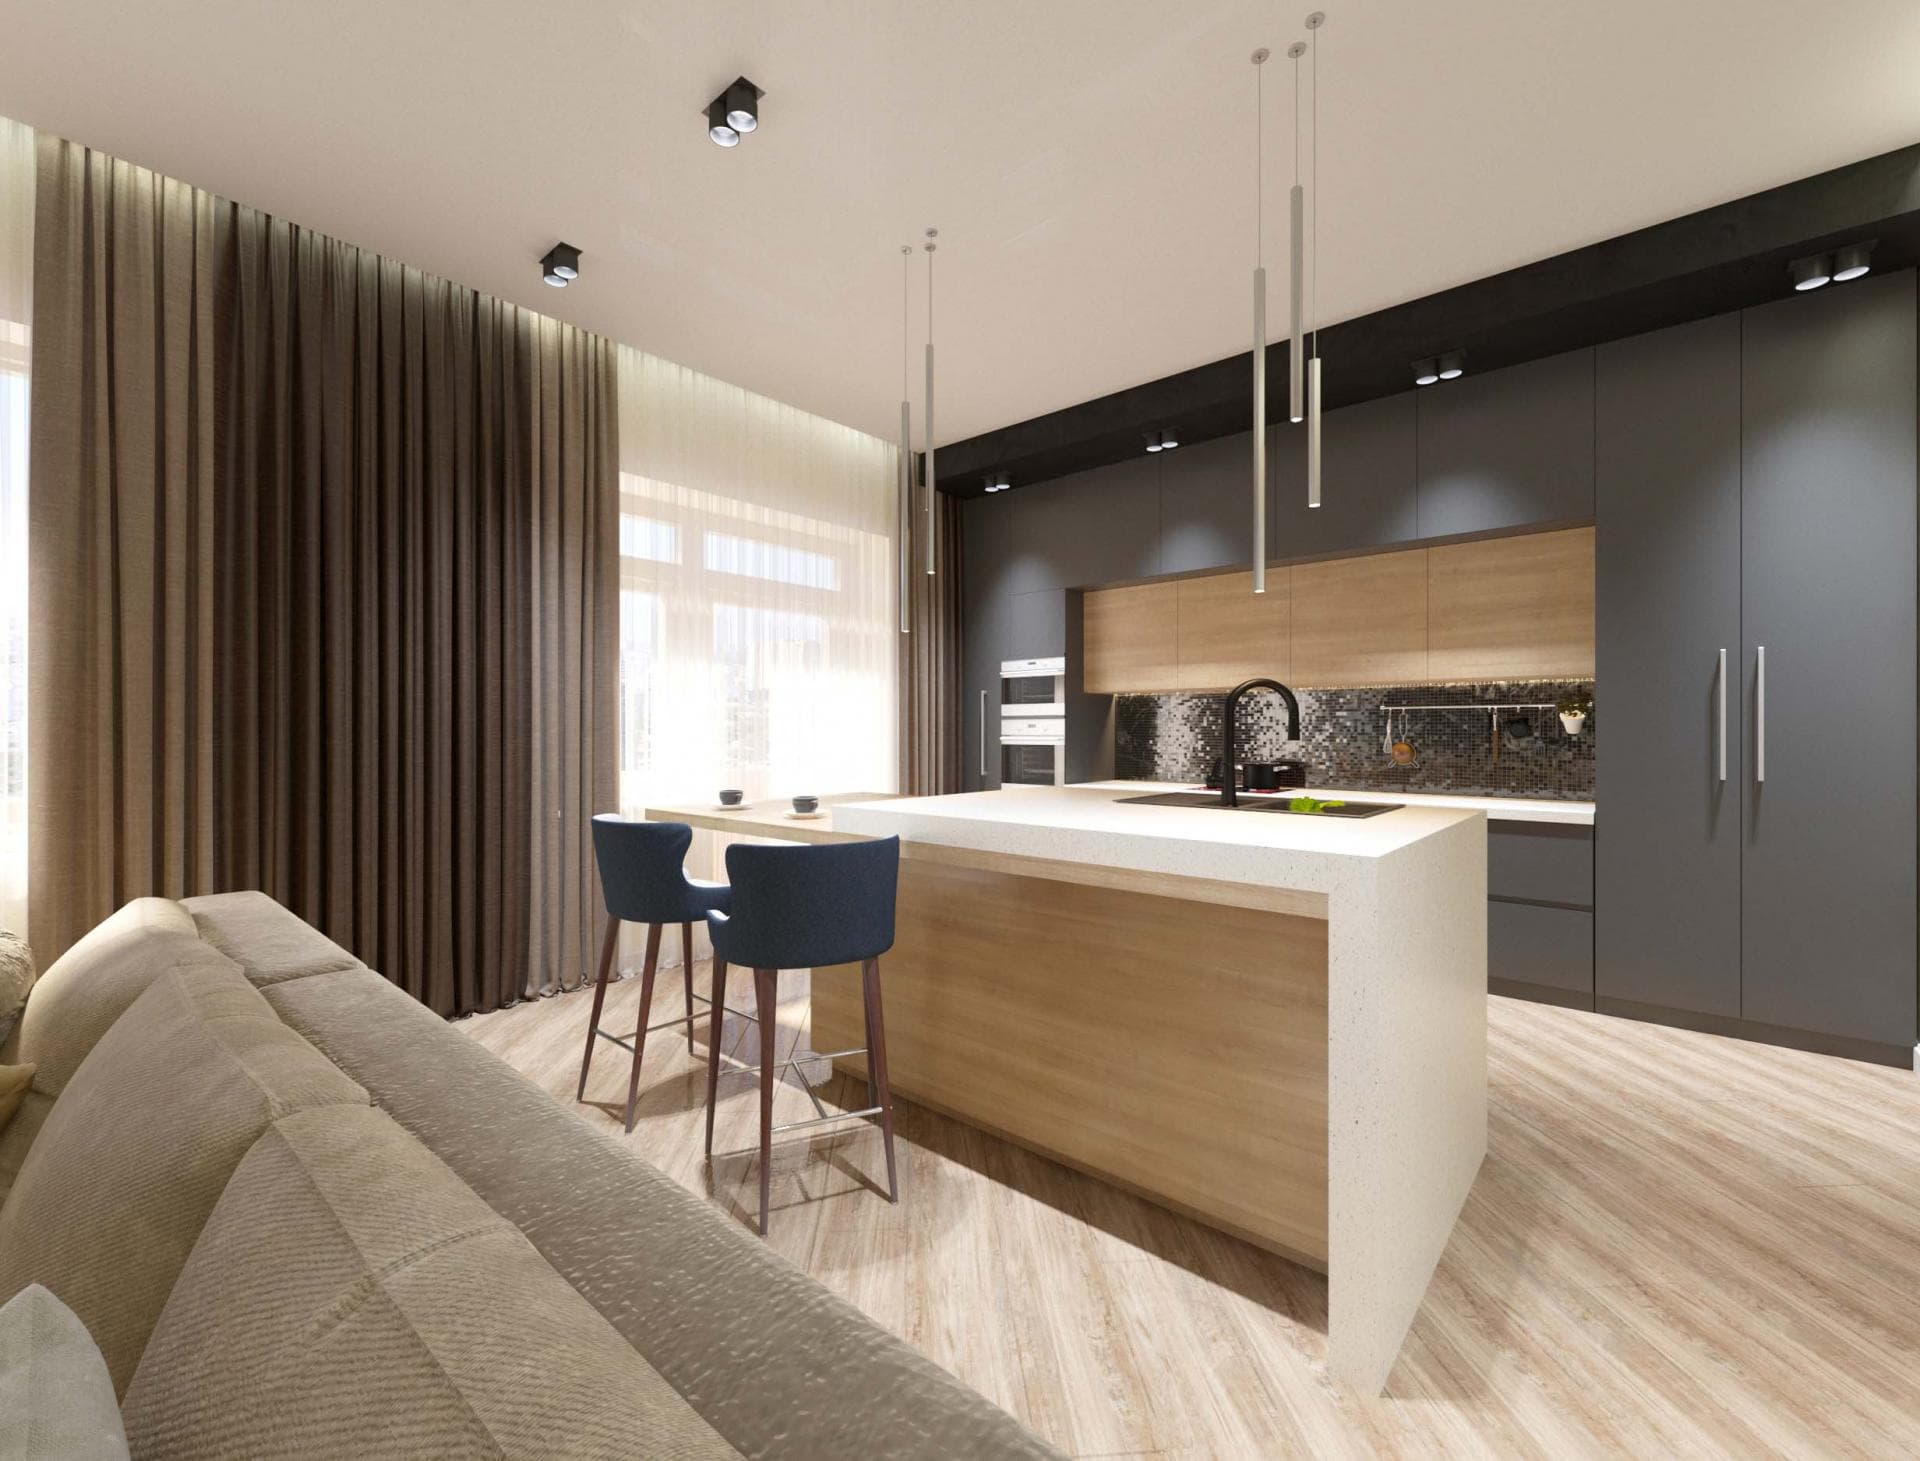 Двухкомнатная квартира в Краснодаре